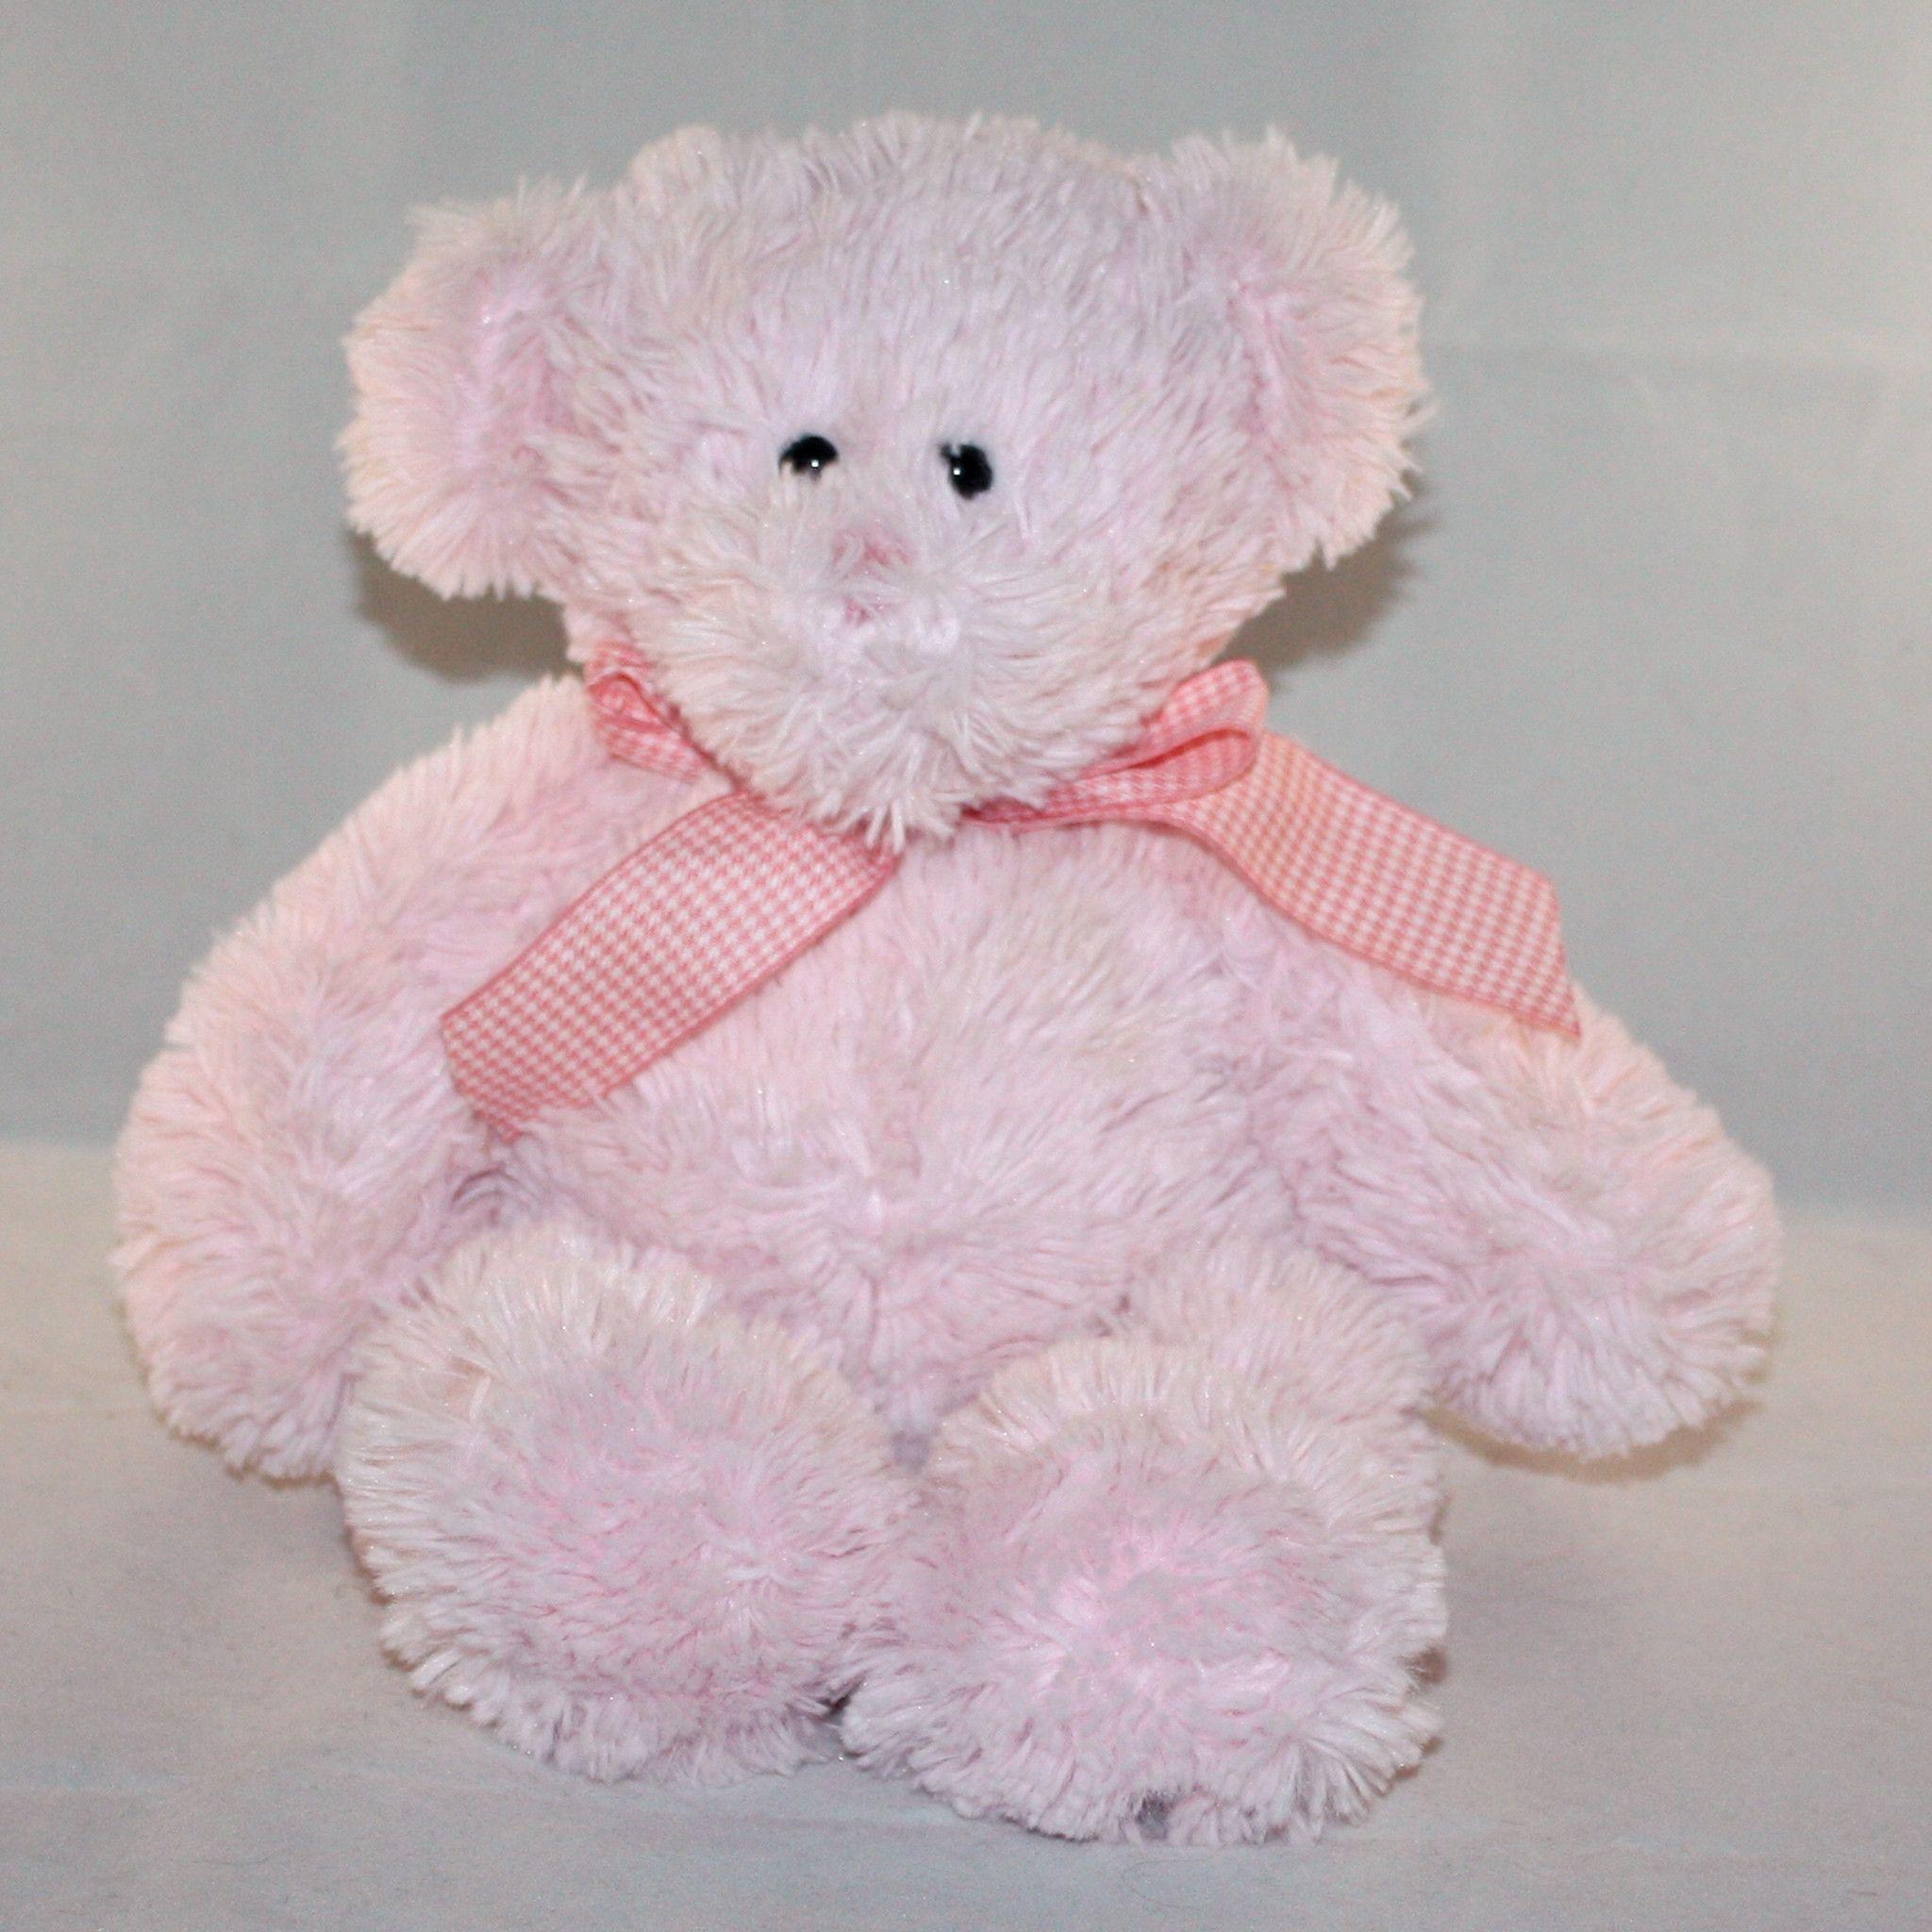 White chef apron target - Animal Adventure For Circo Target Pink Teddy Bear Plush